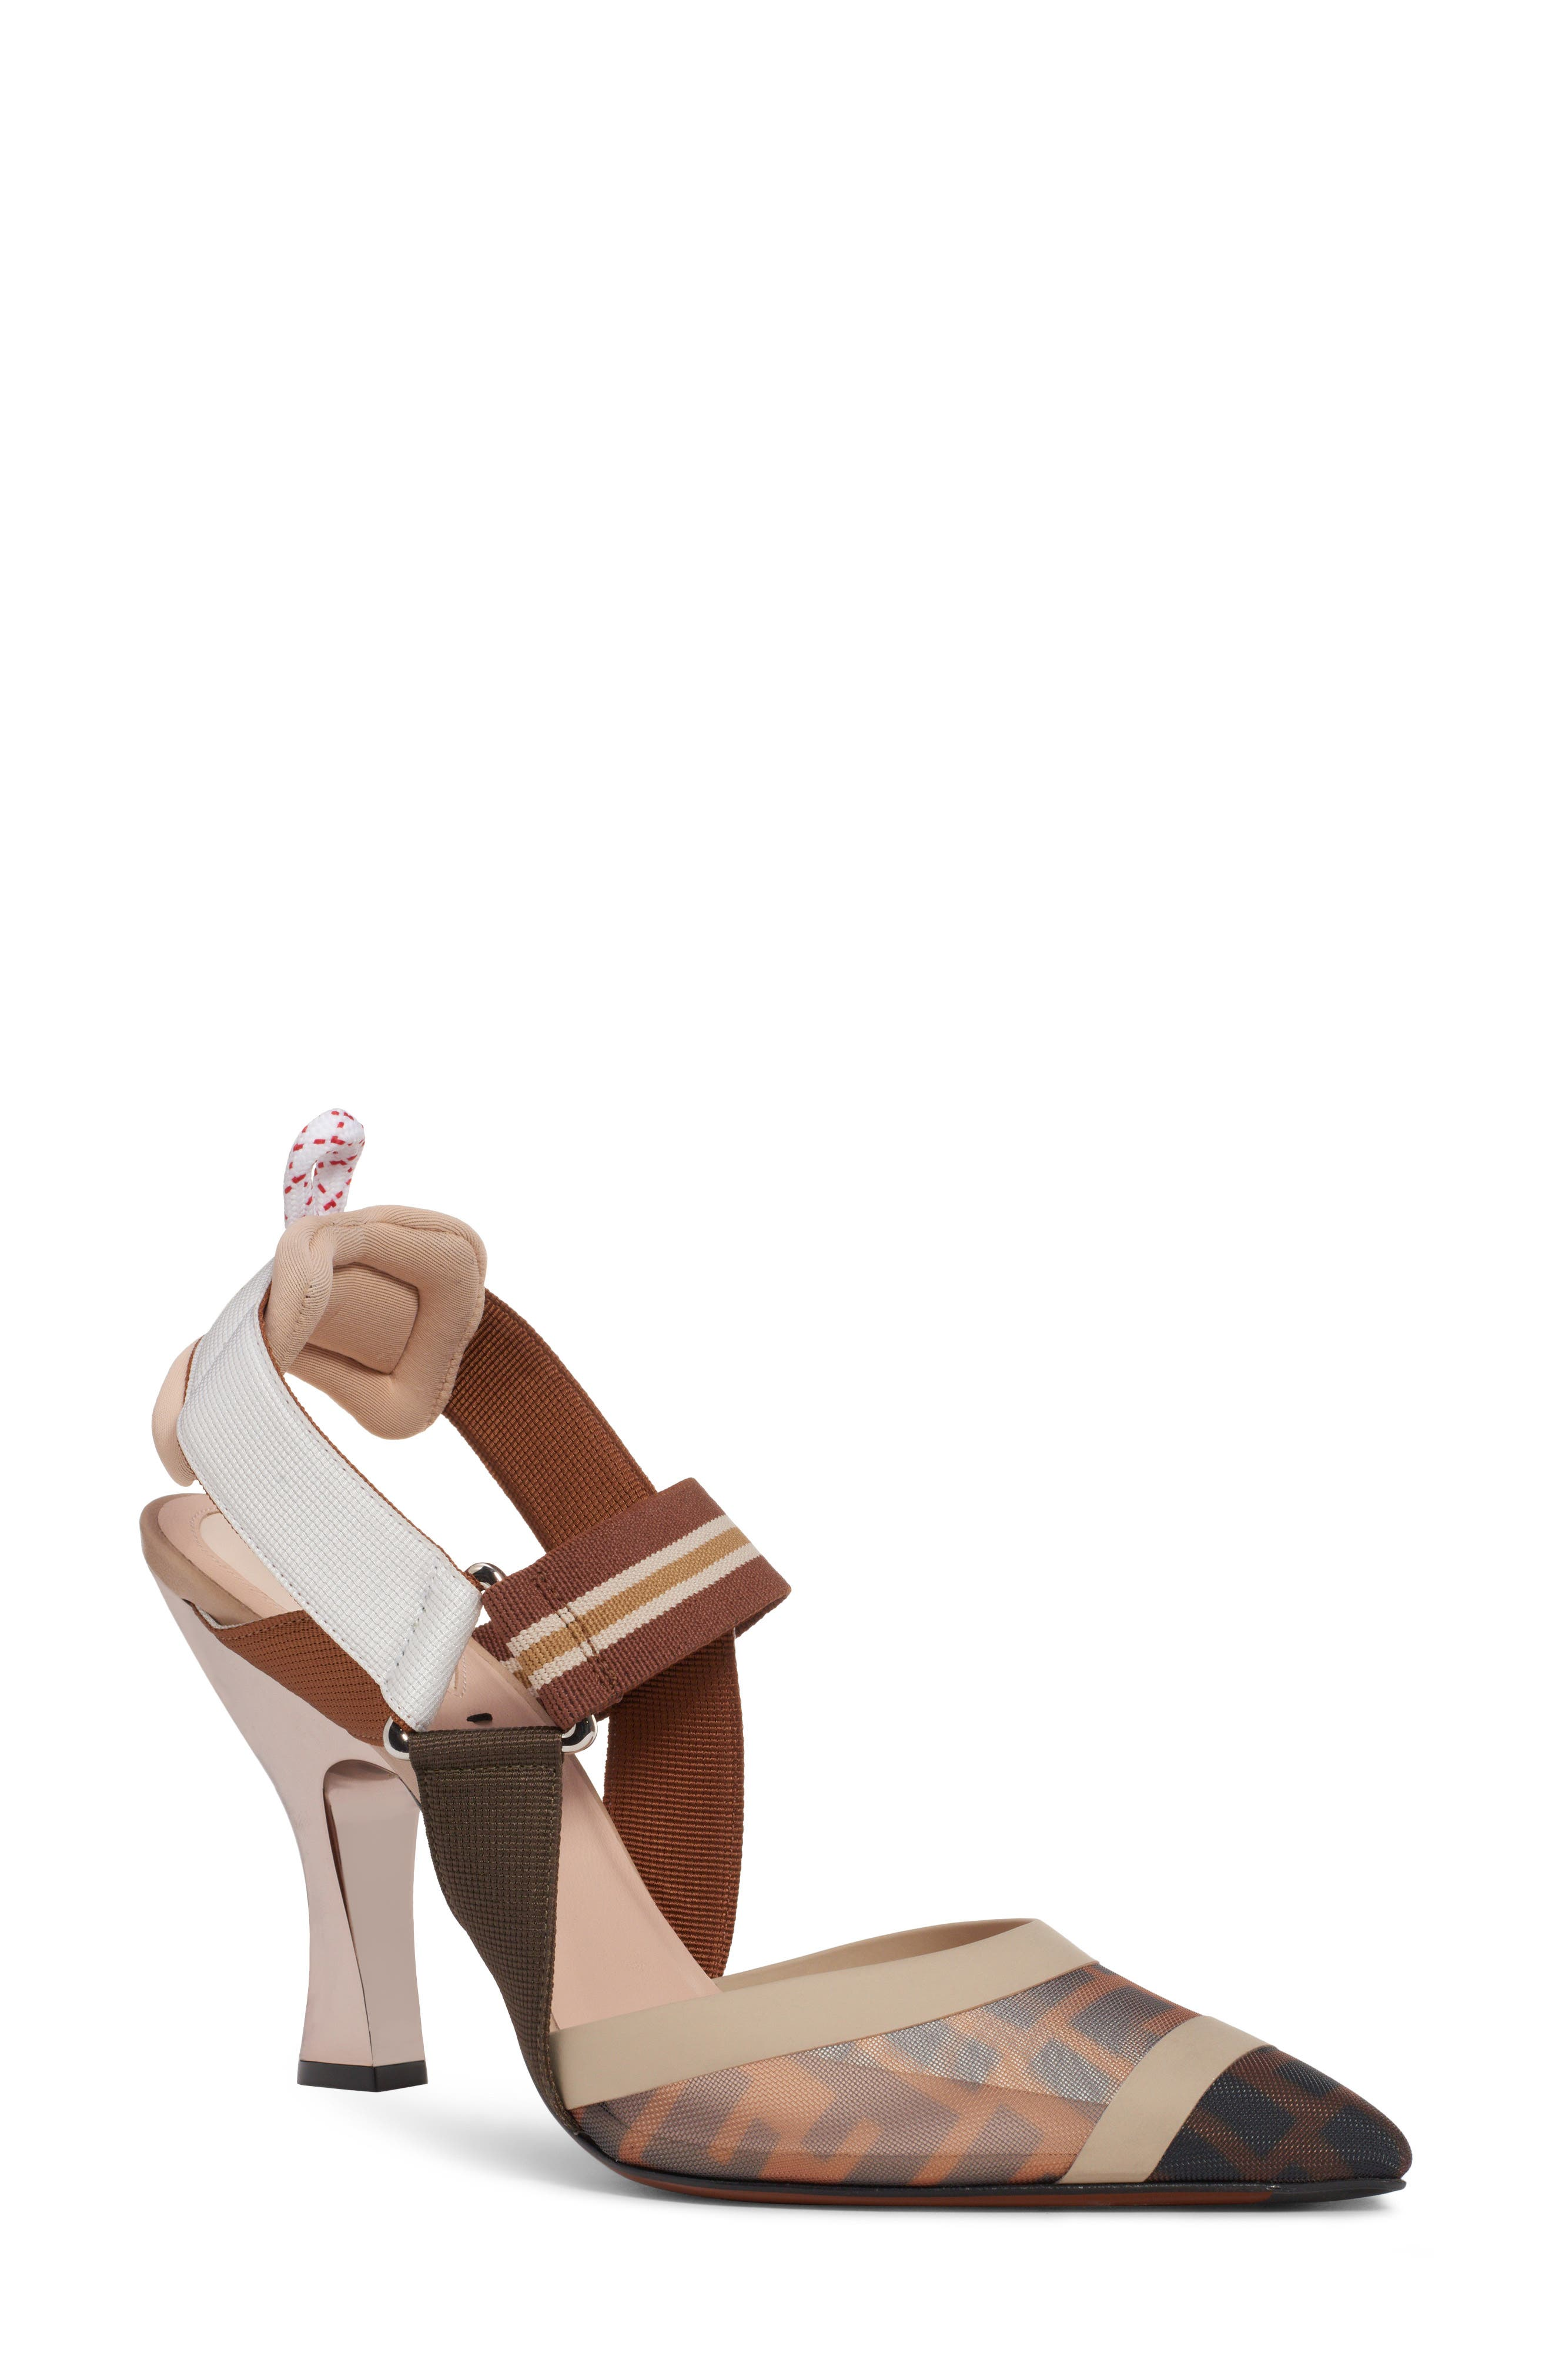 Fendi Colibri Slingback Pump - Brown